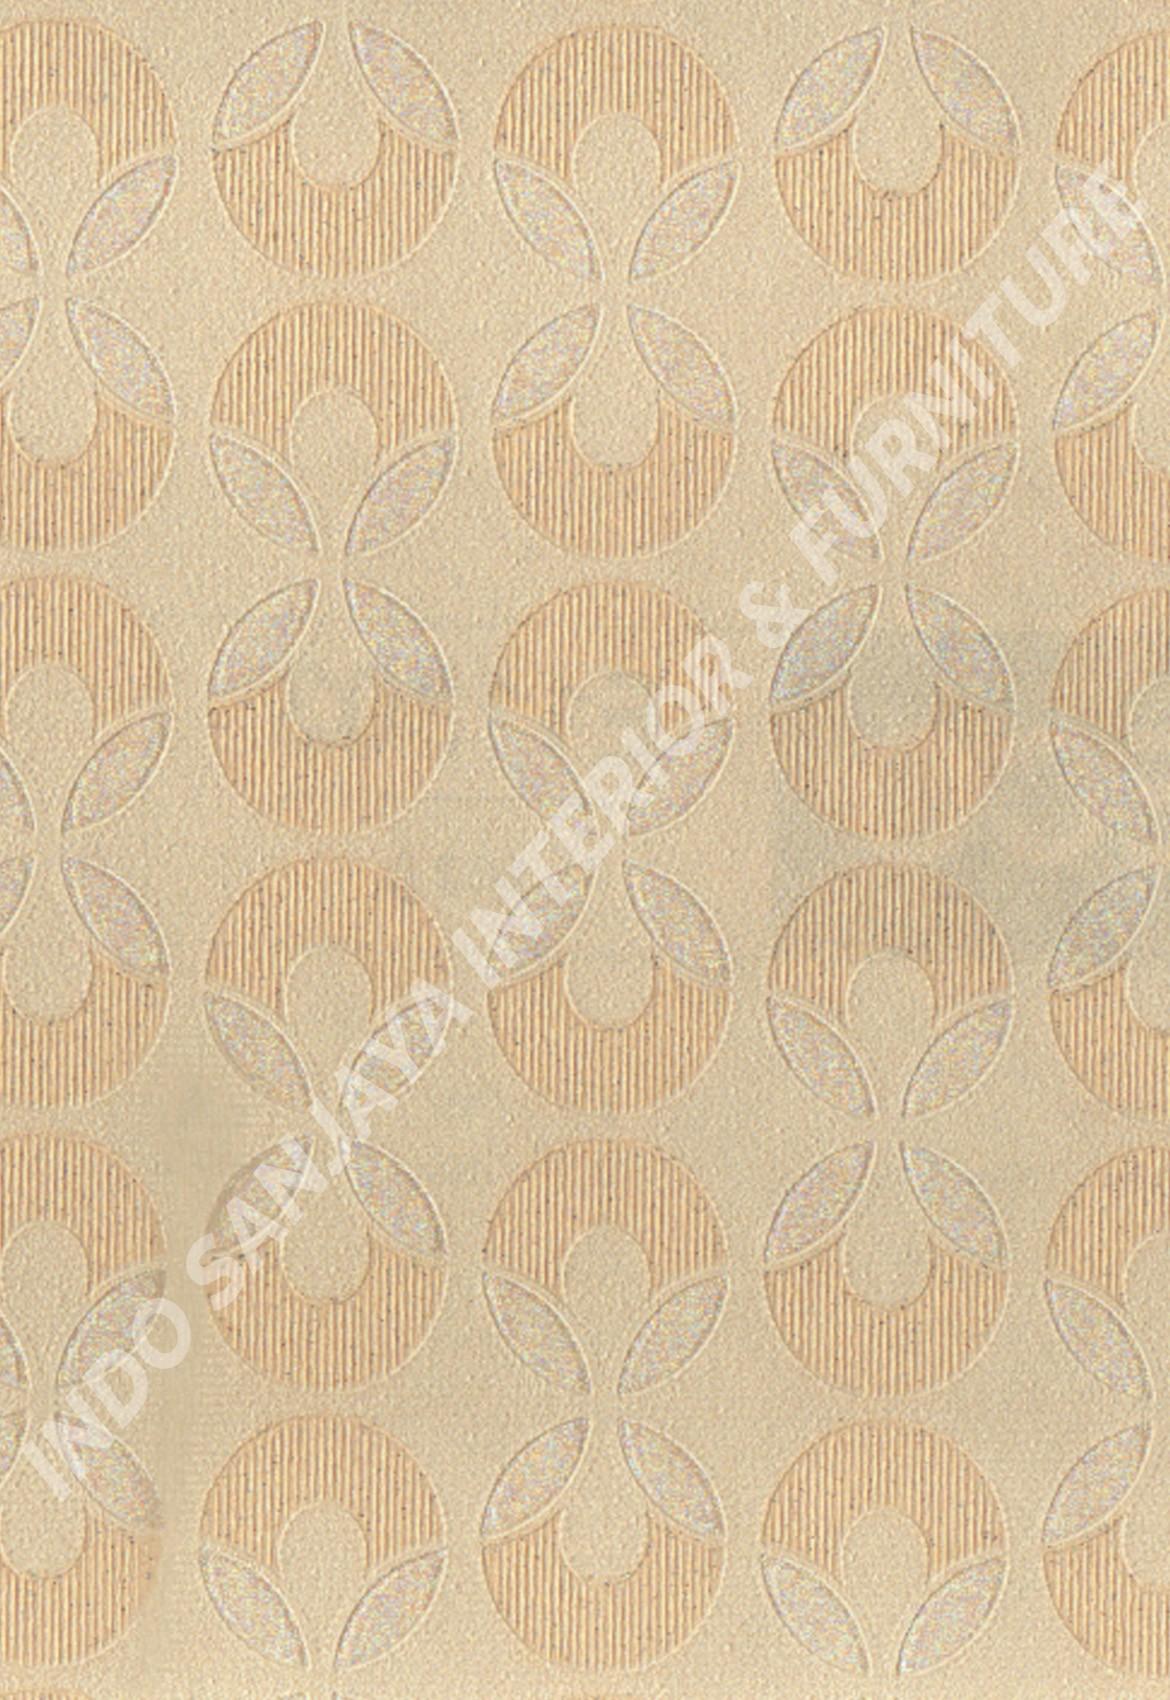 wallpaper   Wallpaper Bulat Geometri E11303:E11303 corak  warna